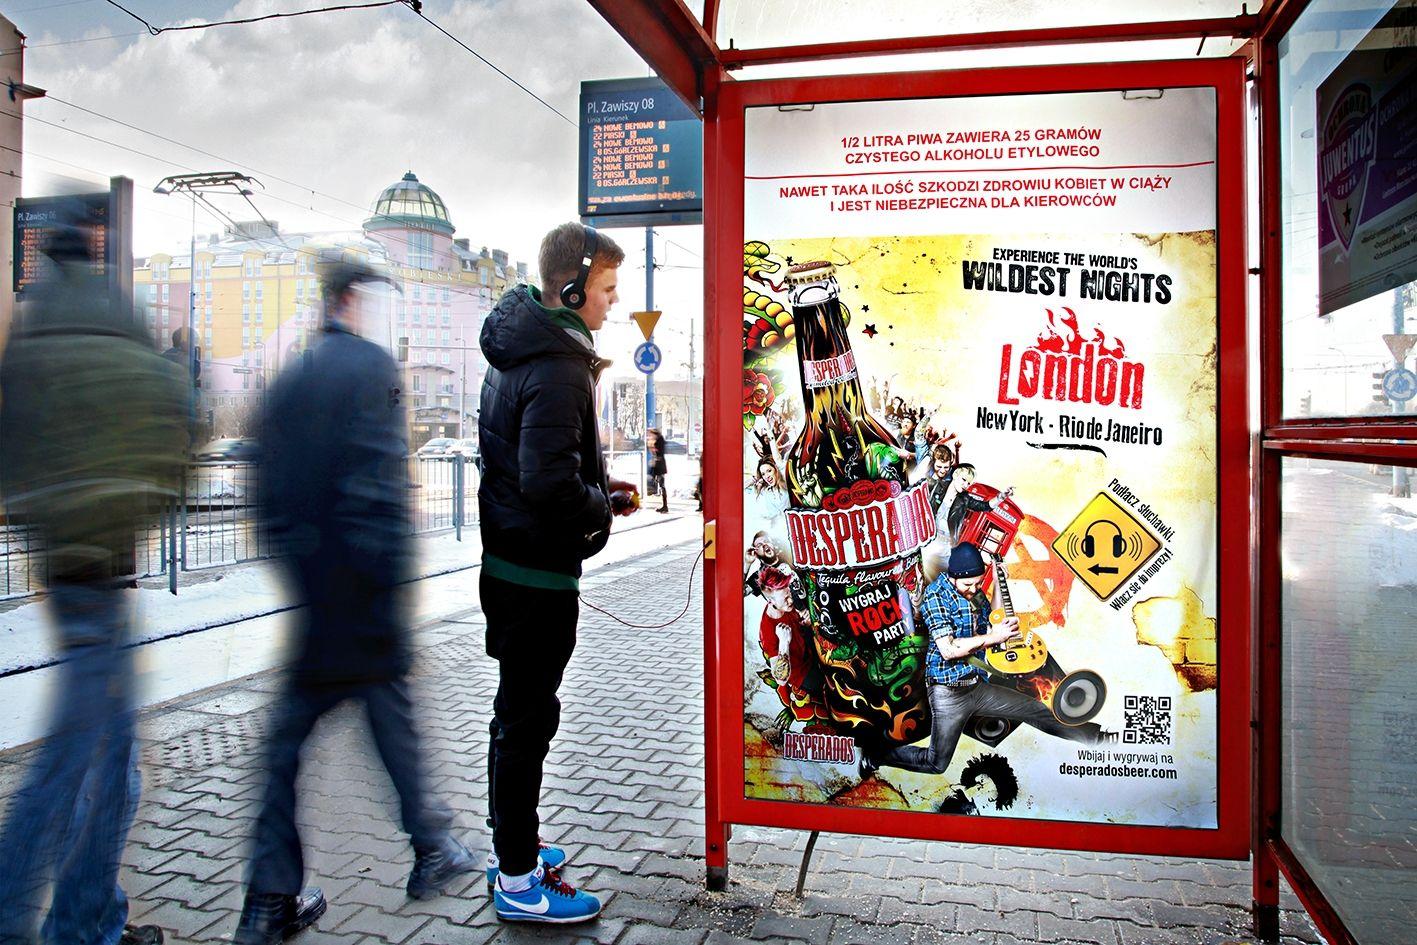 Ams Lider Reklamy Zewnetrznej W Polsce Ams Com Pl Landmarks Times Square Travel